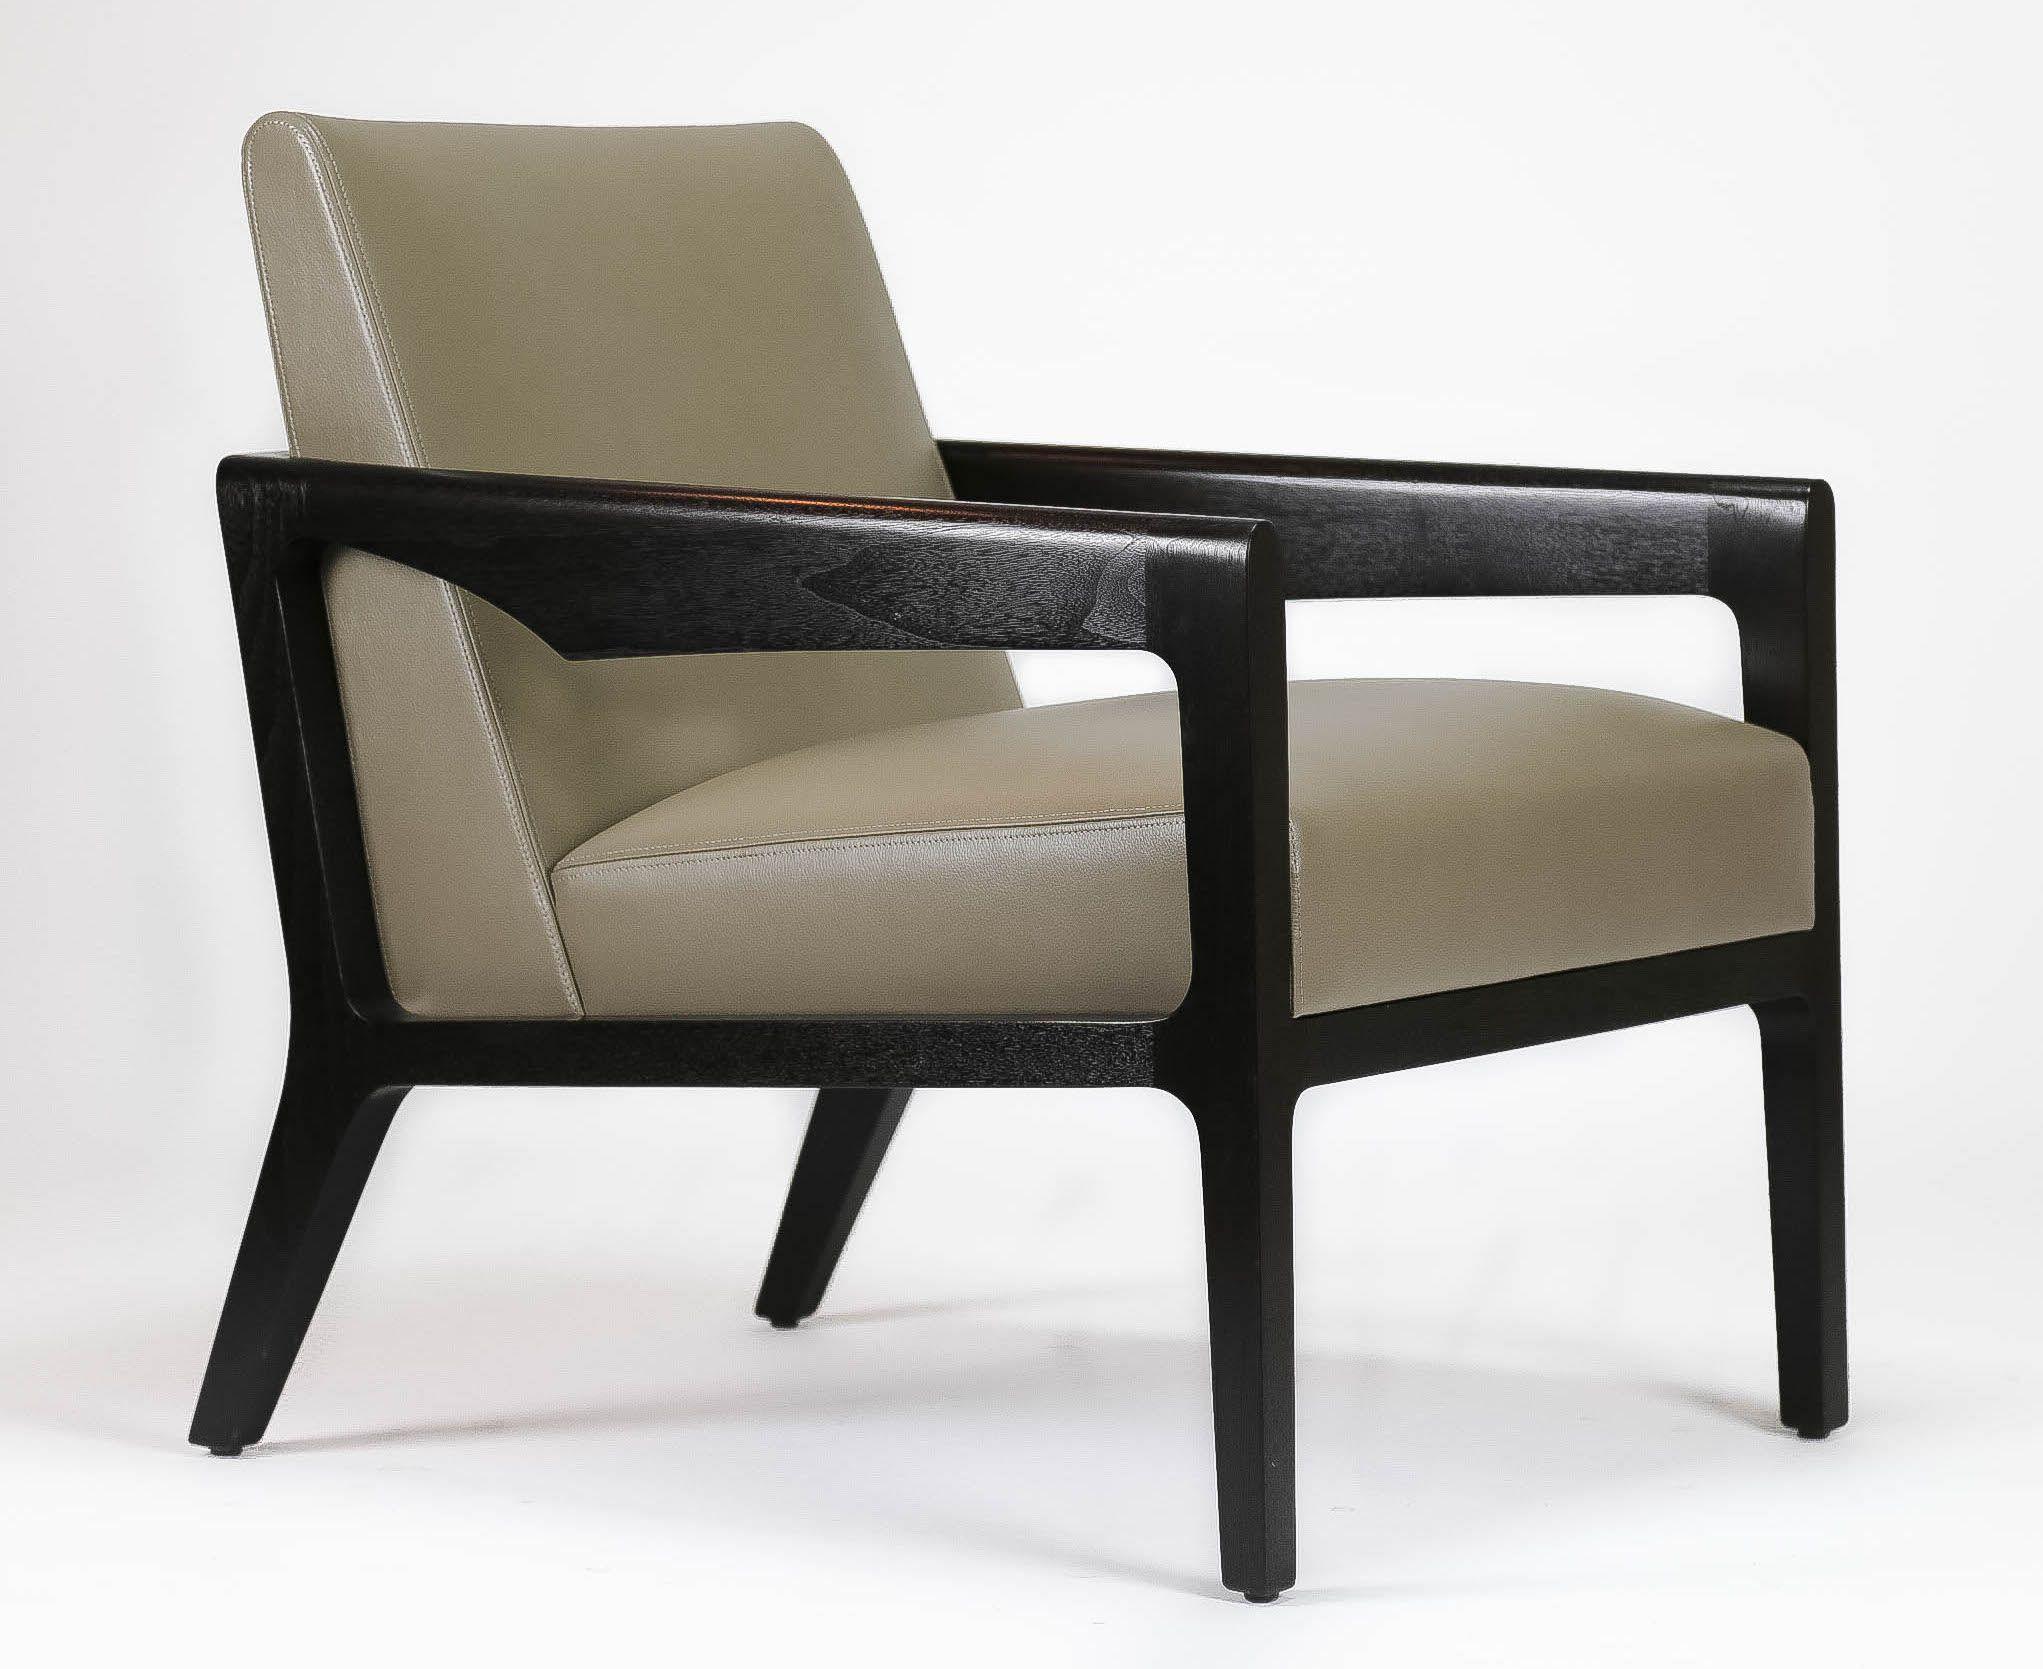 Linea Lounge Chair | S ofa | Pinterest | Sillas, Sillones y Sillas ...